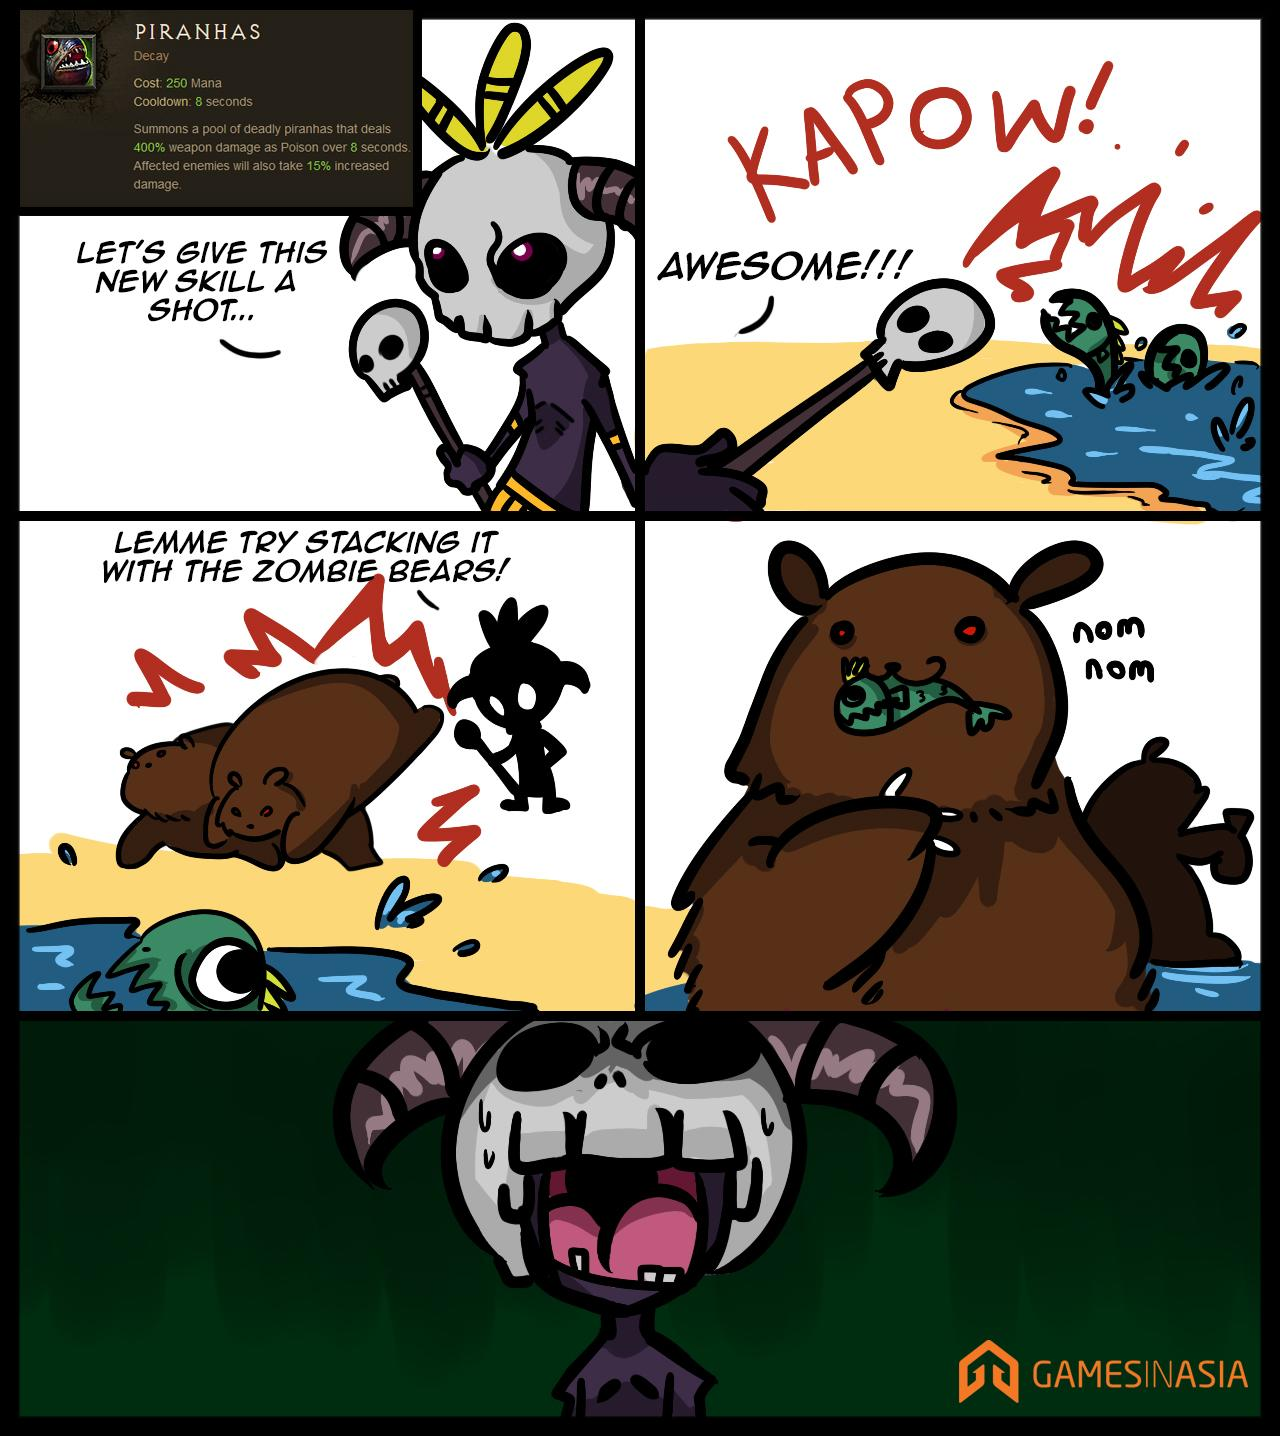 Corona Virus Zombie Hoax: Weekly Comic: Zombie Bears And Pirahnas Don't Mix In